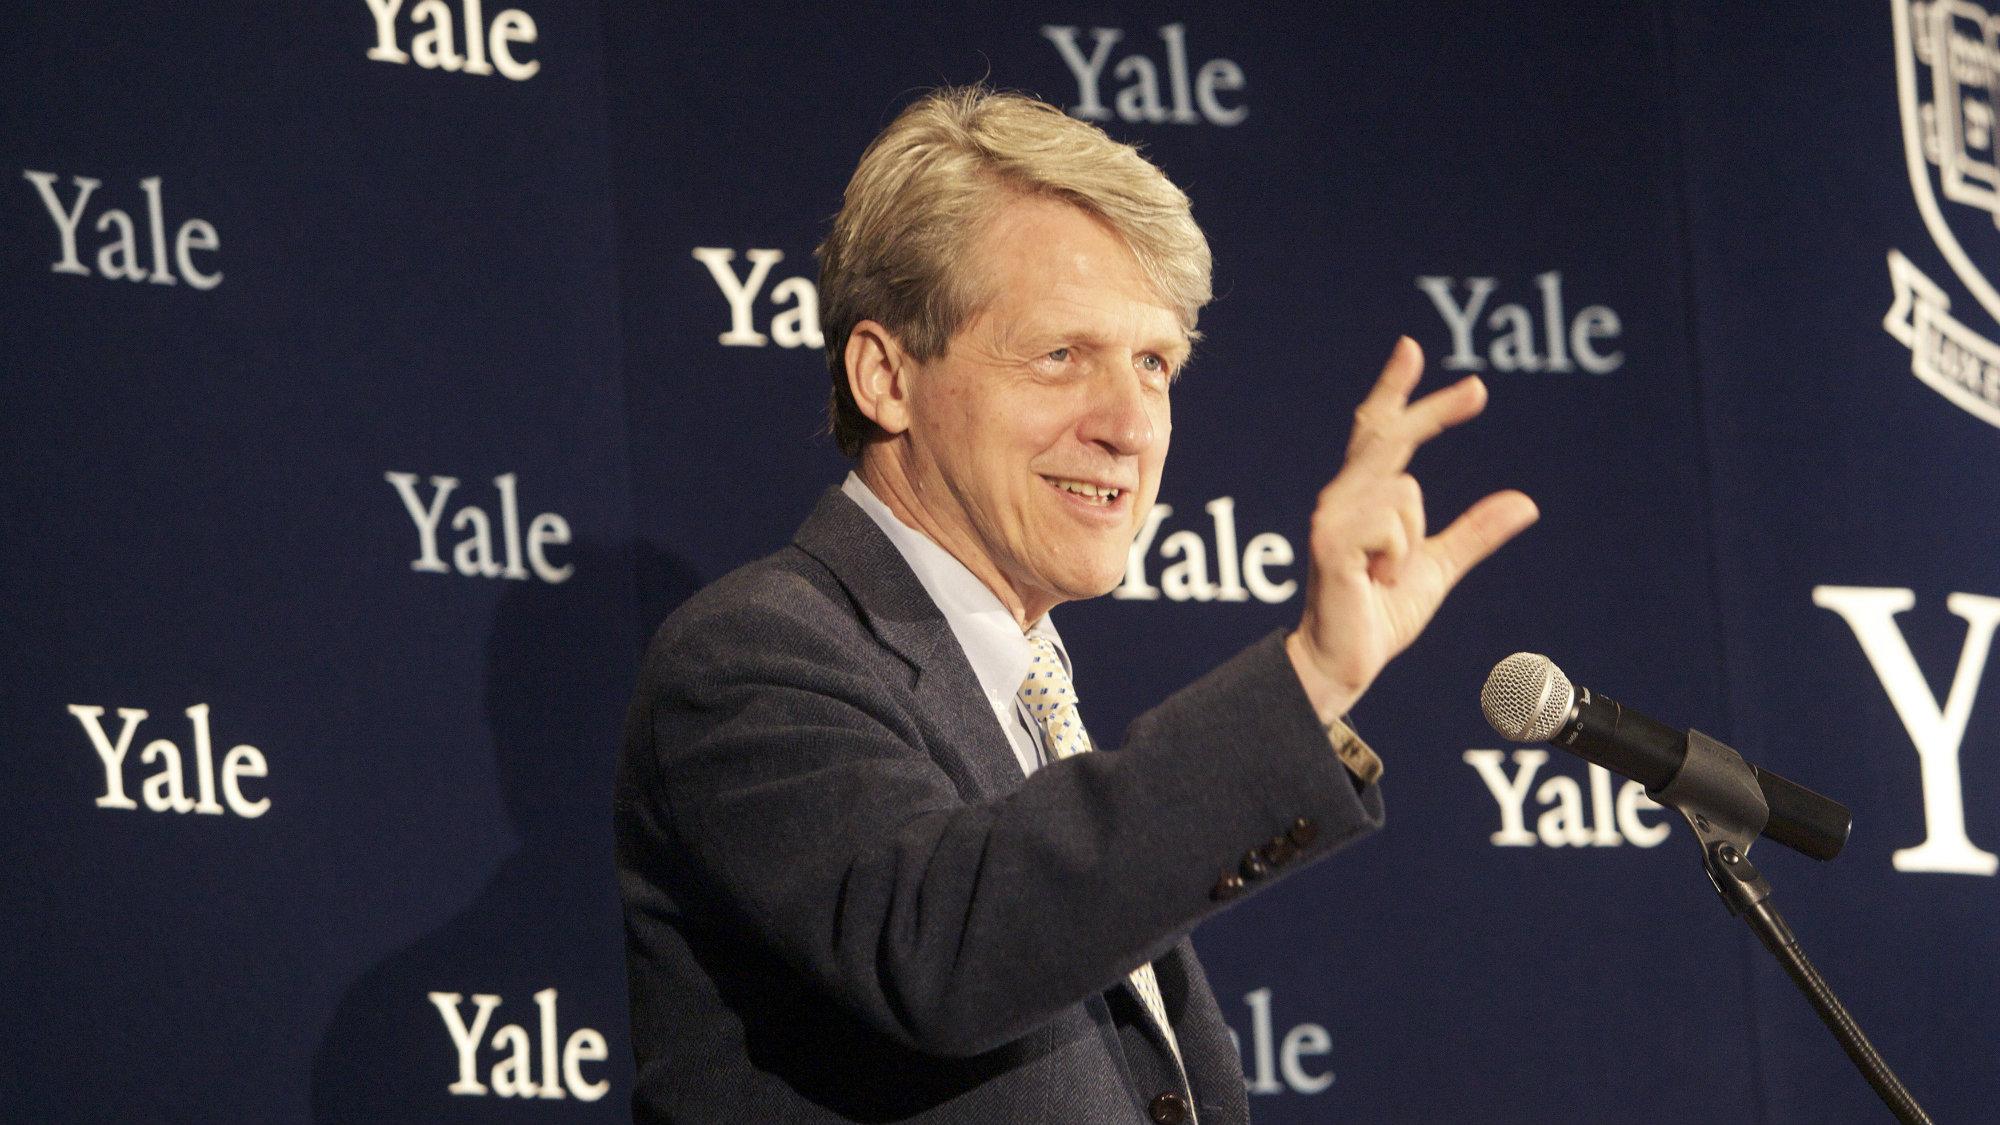 Robert Shiller at a press conference